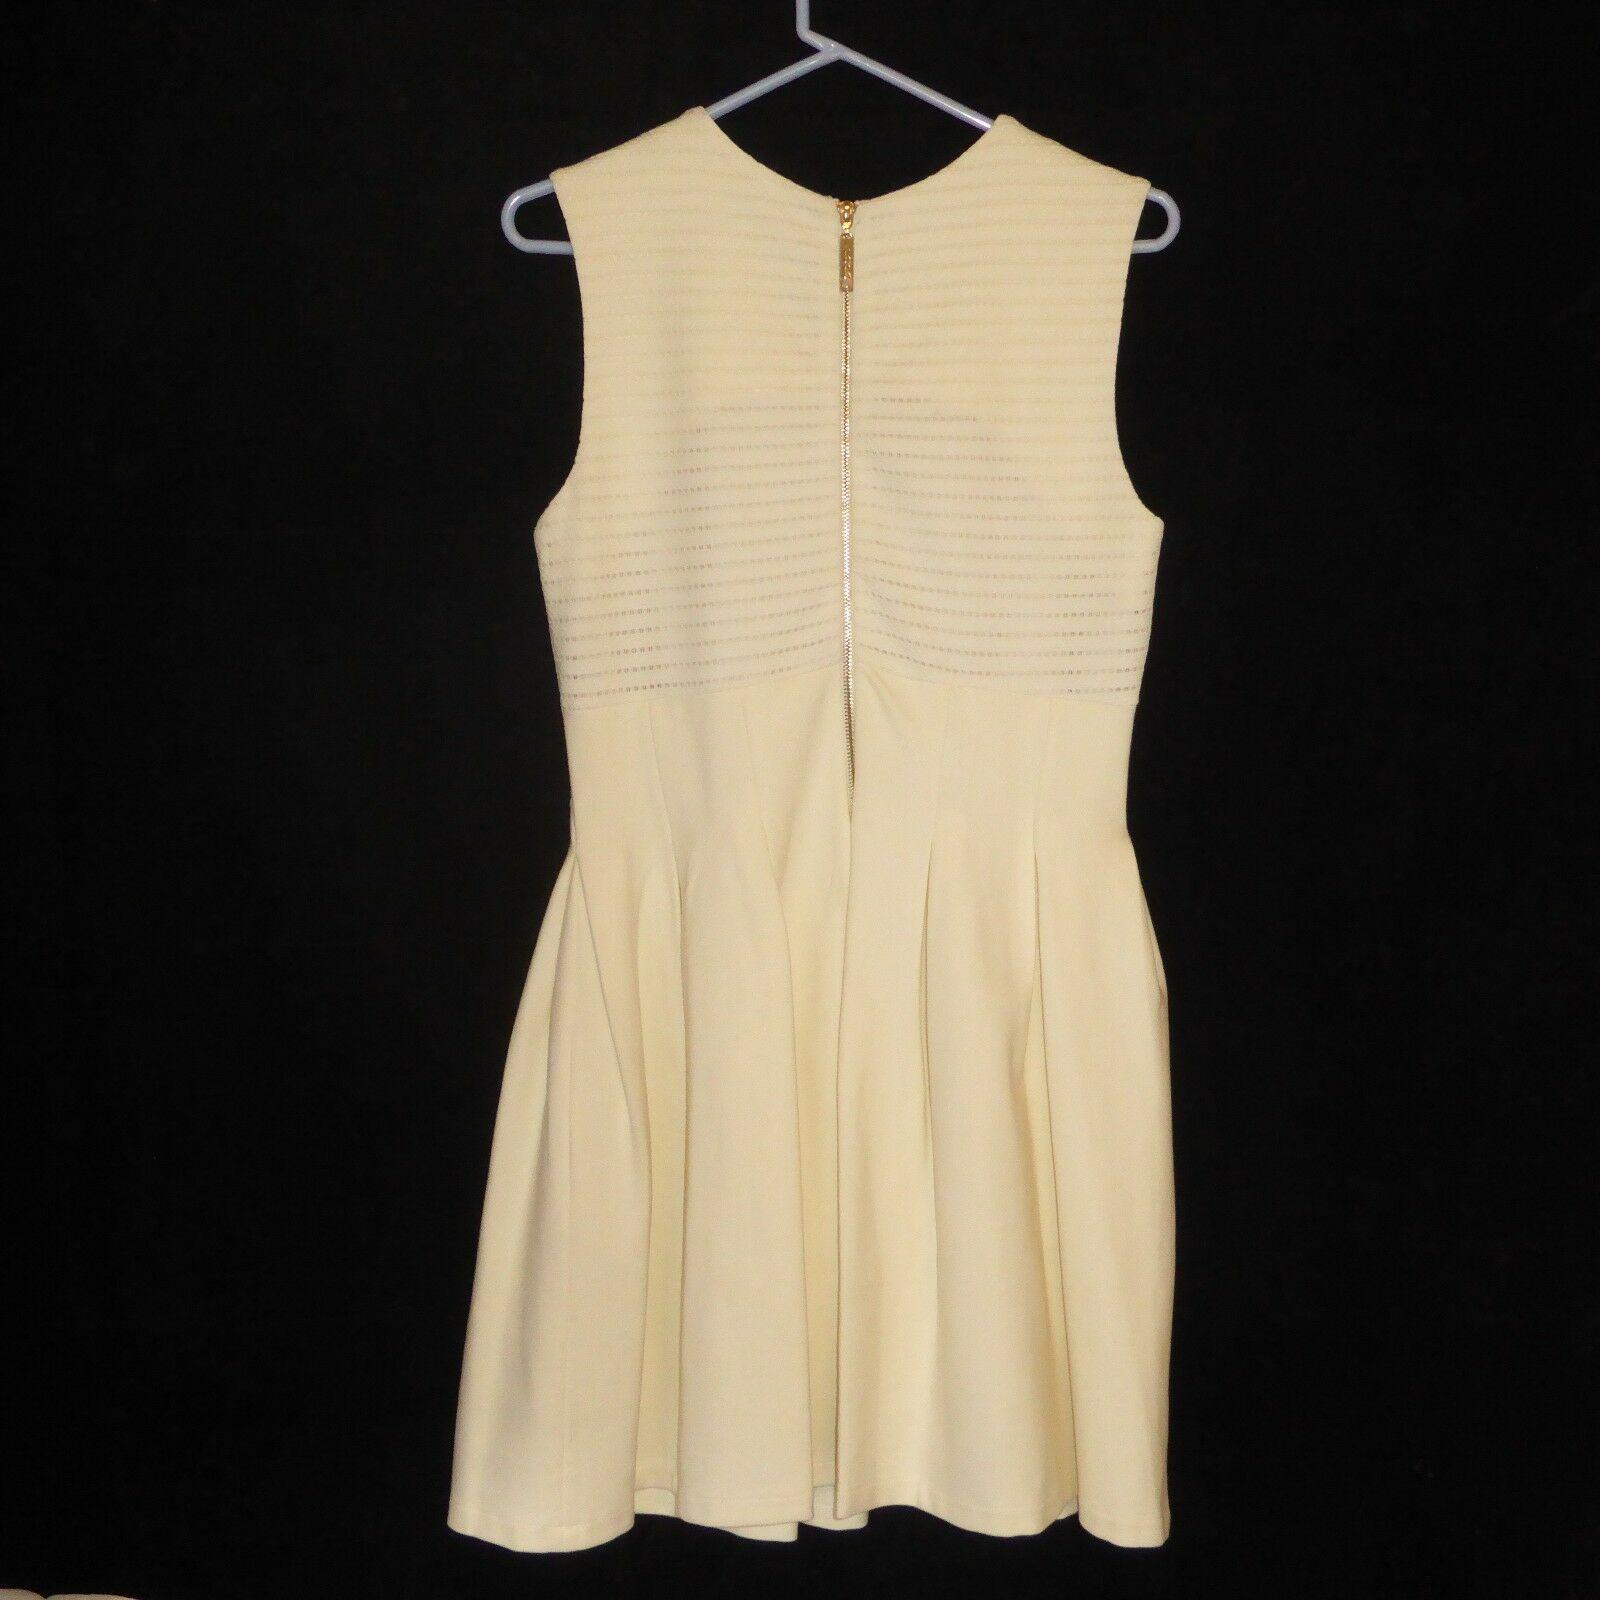 NWT BCBG Maxazria Medium Lined Dress Off White Color NEW $368 Sleeveless BackZip